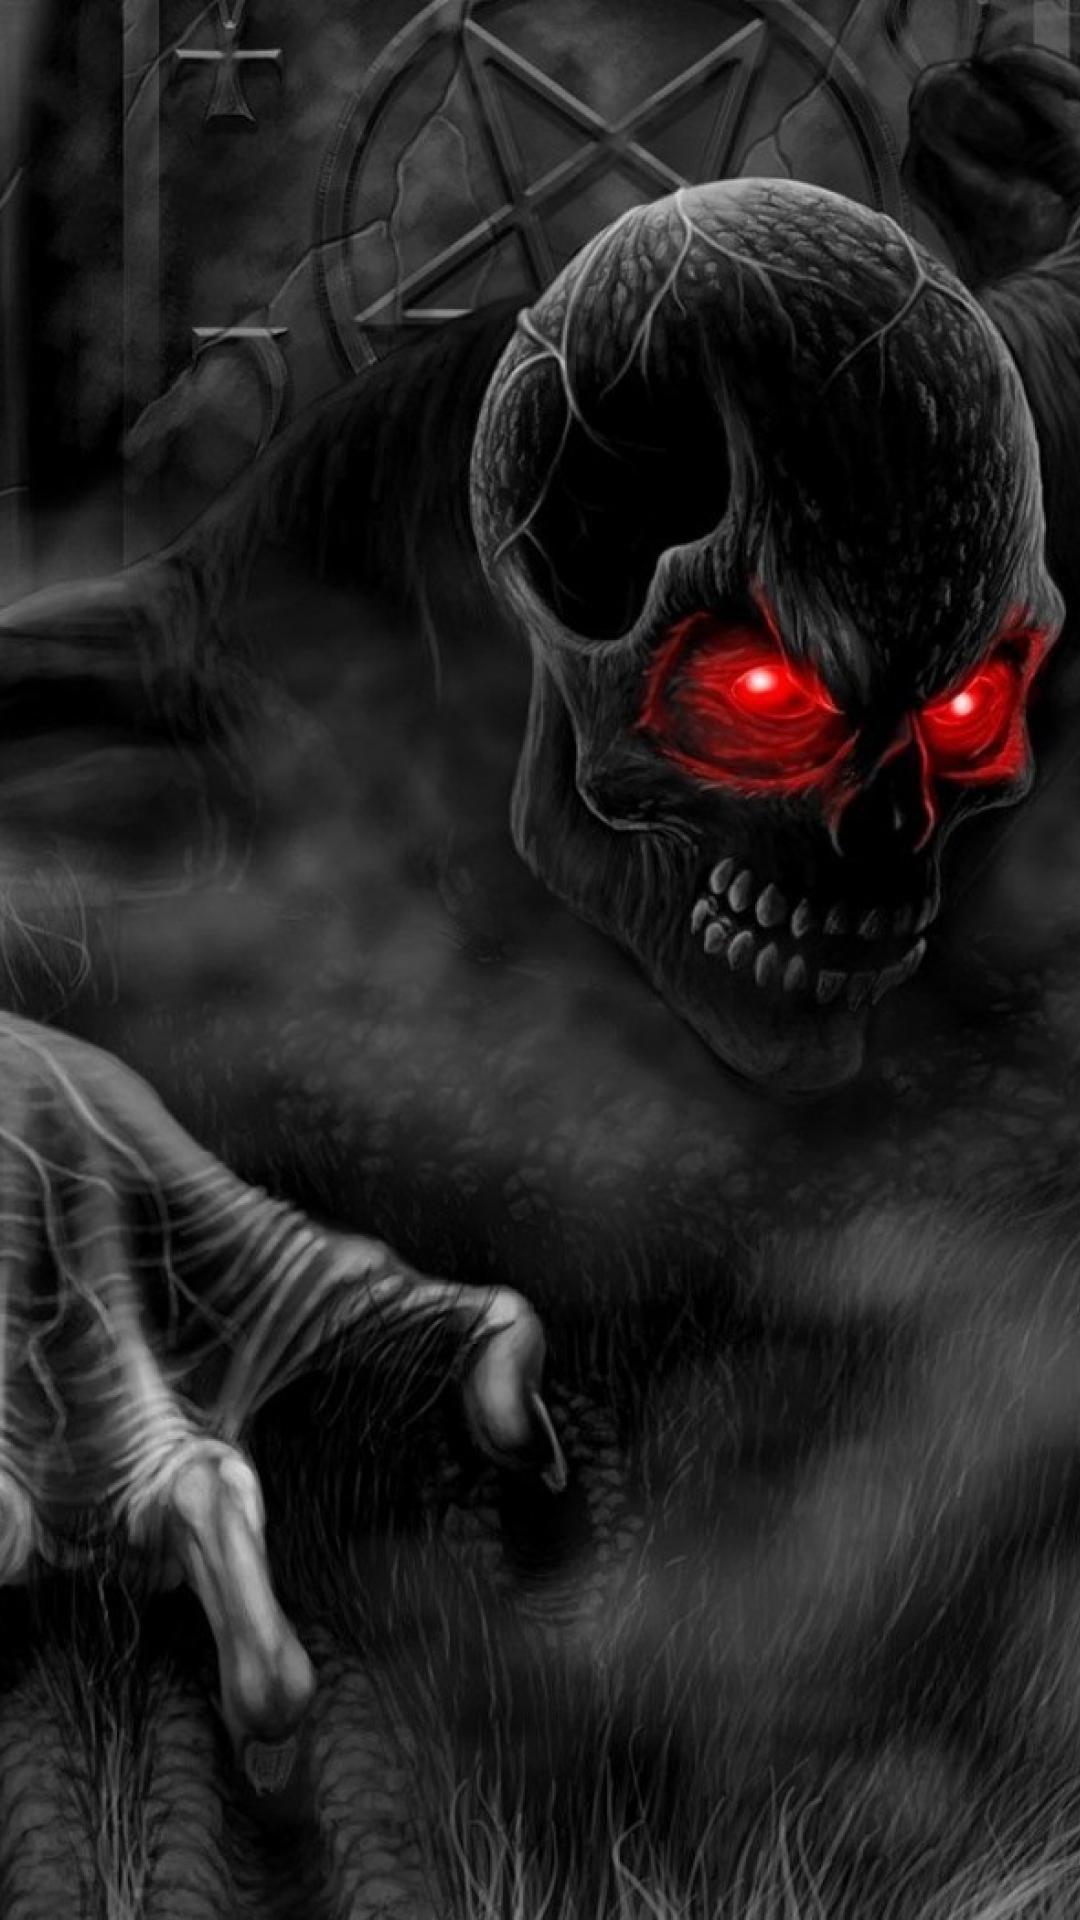 Horror creepy black death dark monsters gothic wallpaper 69249 1080x1920